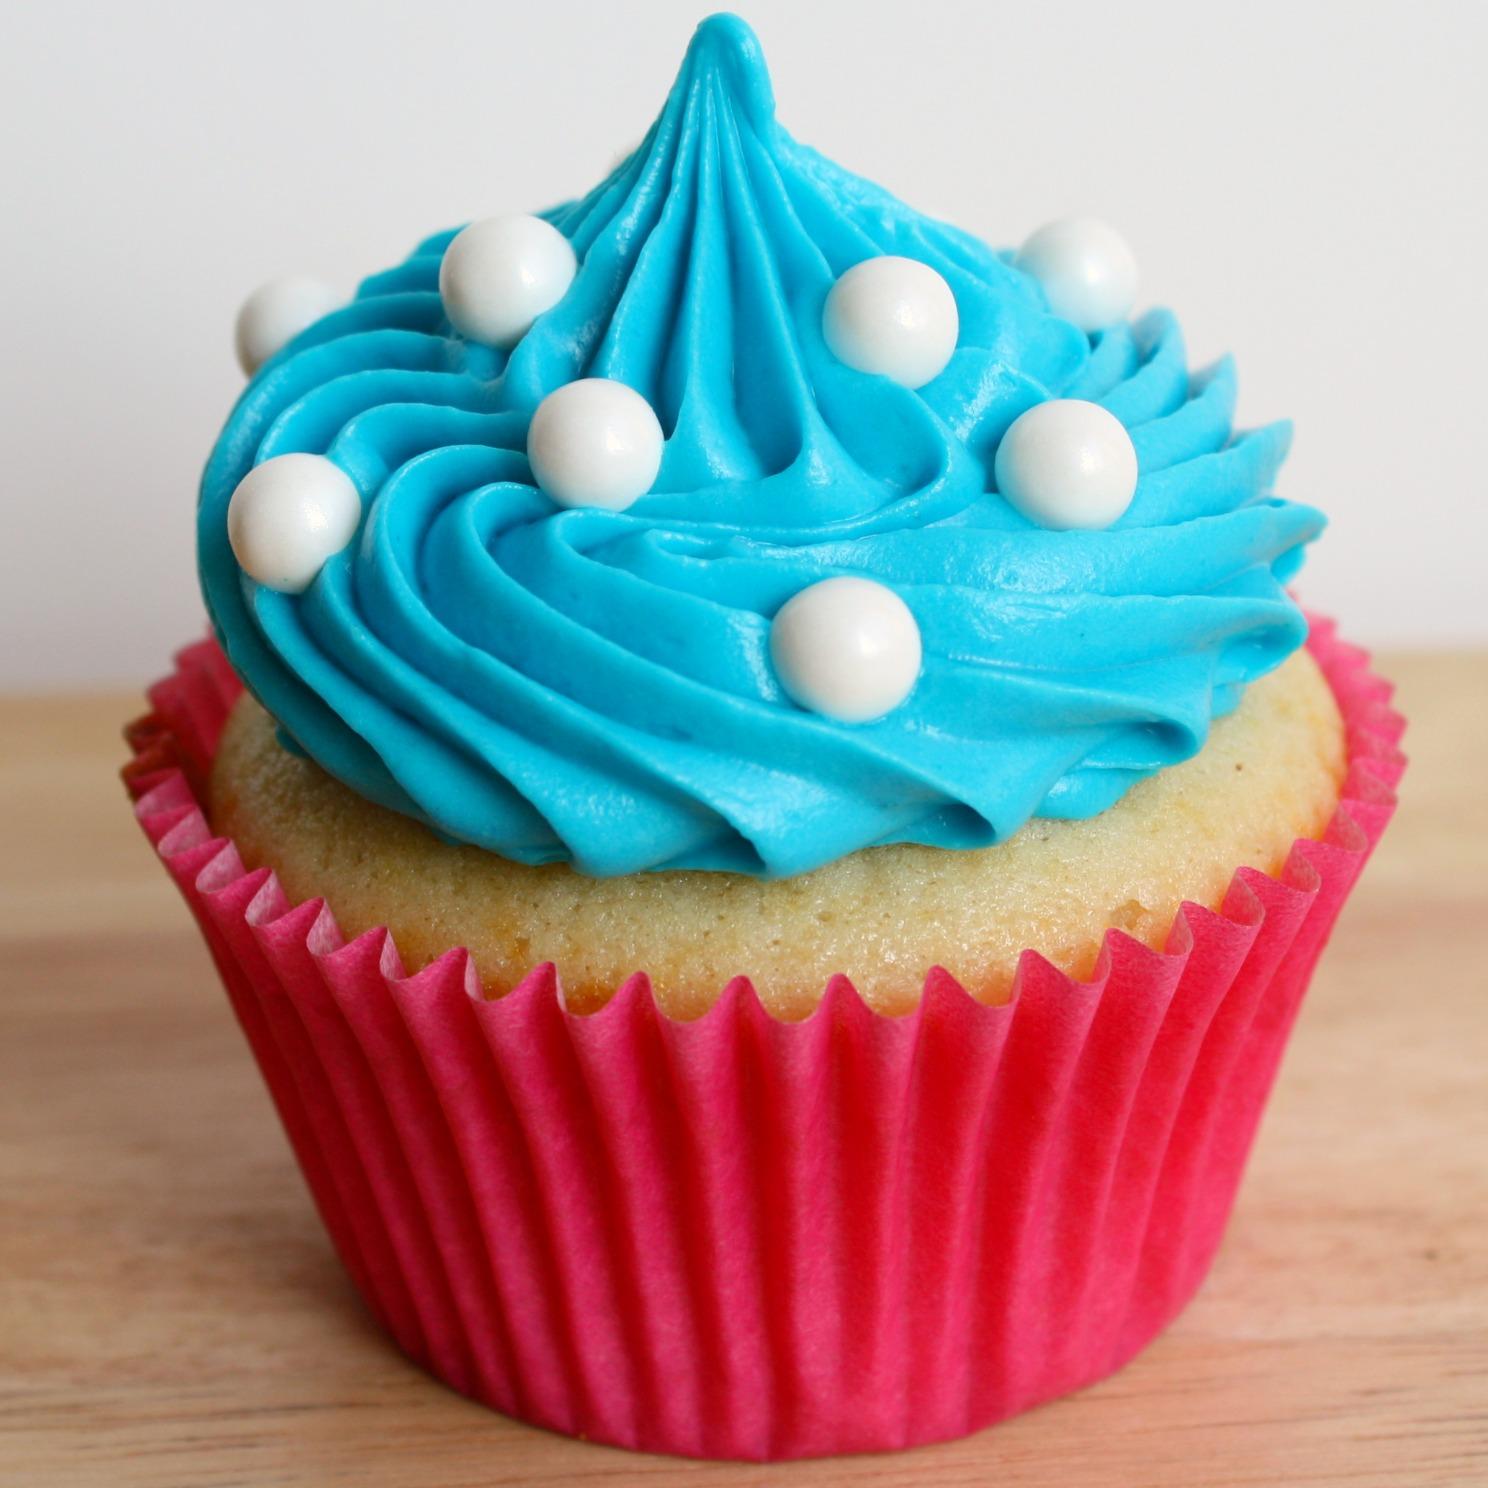 Vanilla Cupcake clipart one cupcake Art Library Cupcake Radio (Wednesday